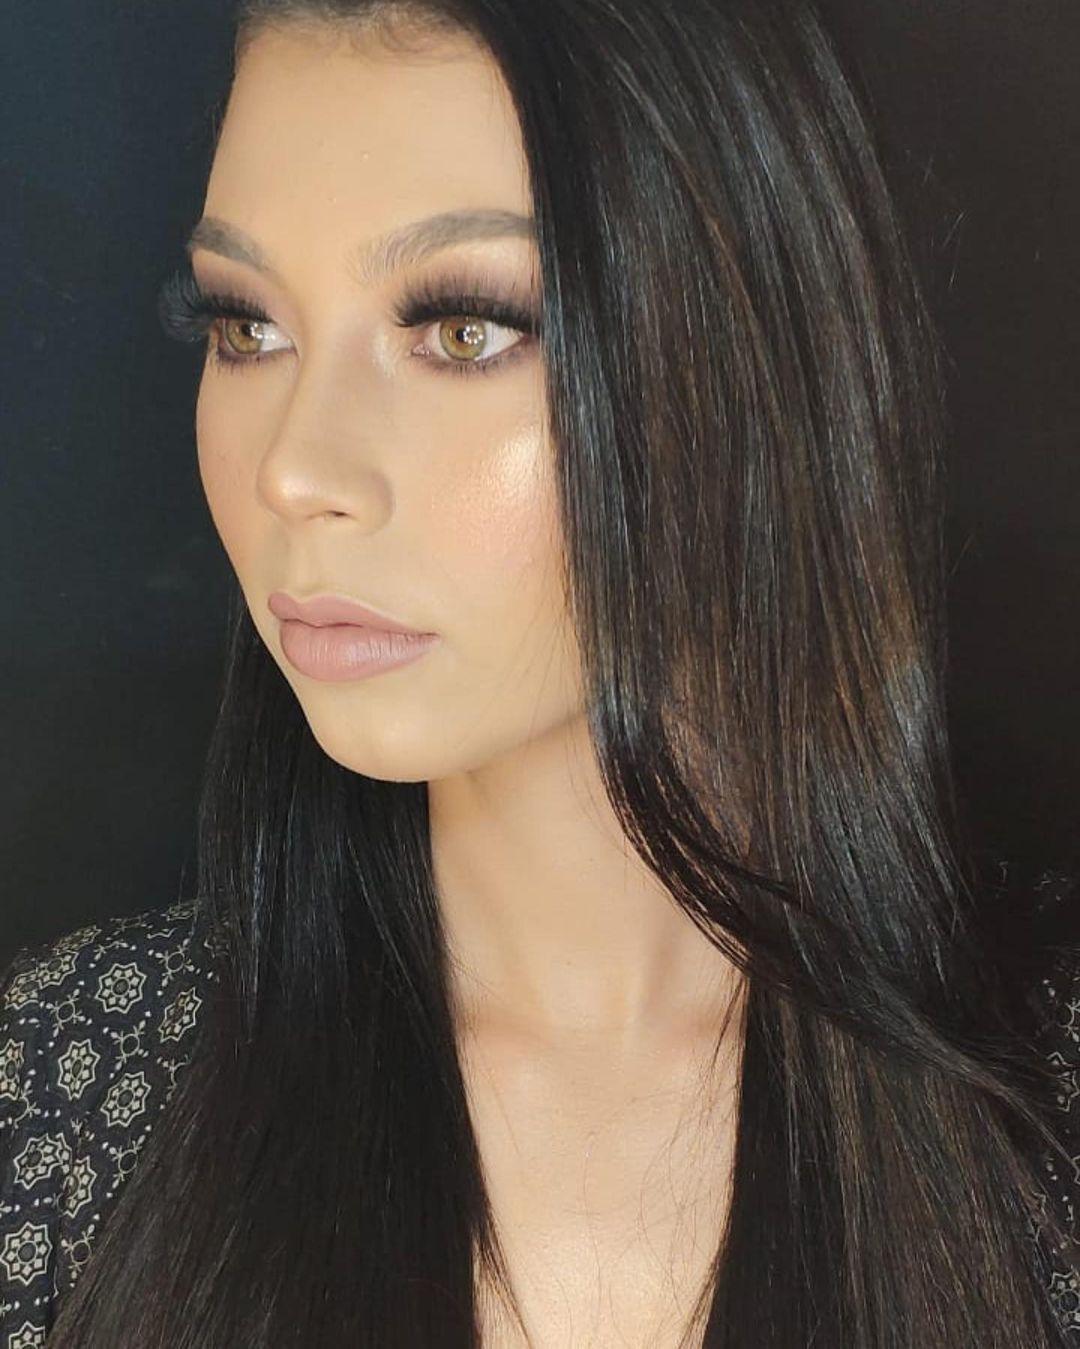 julia alves, miss cerrado goiano mundo 2019. - Página 6 Fumrrj10